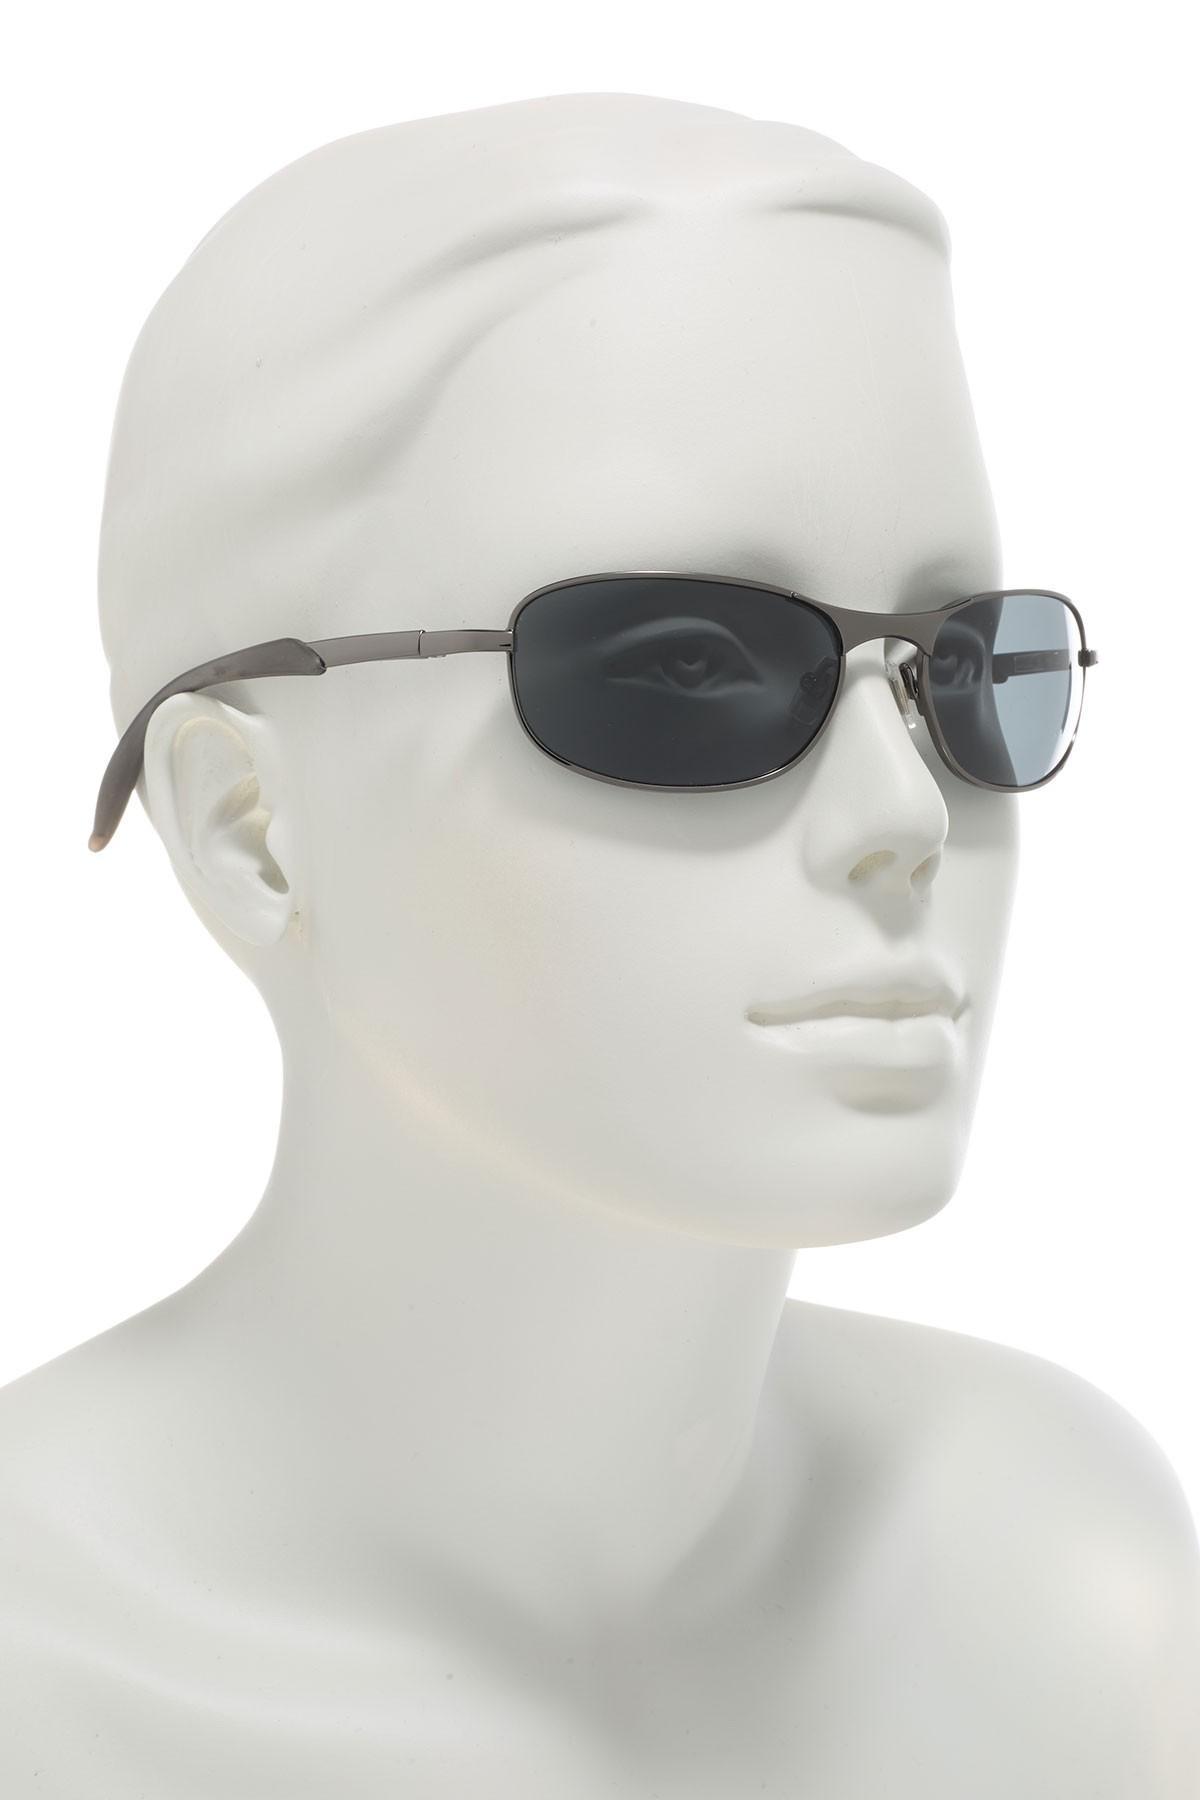 935f8301e7c33 57mm Fossil Lyst Hydro Sunglasses Fossil Lyst g84xqWnzzE